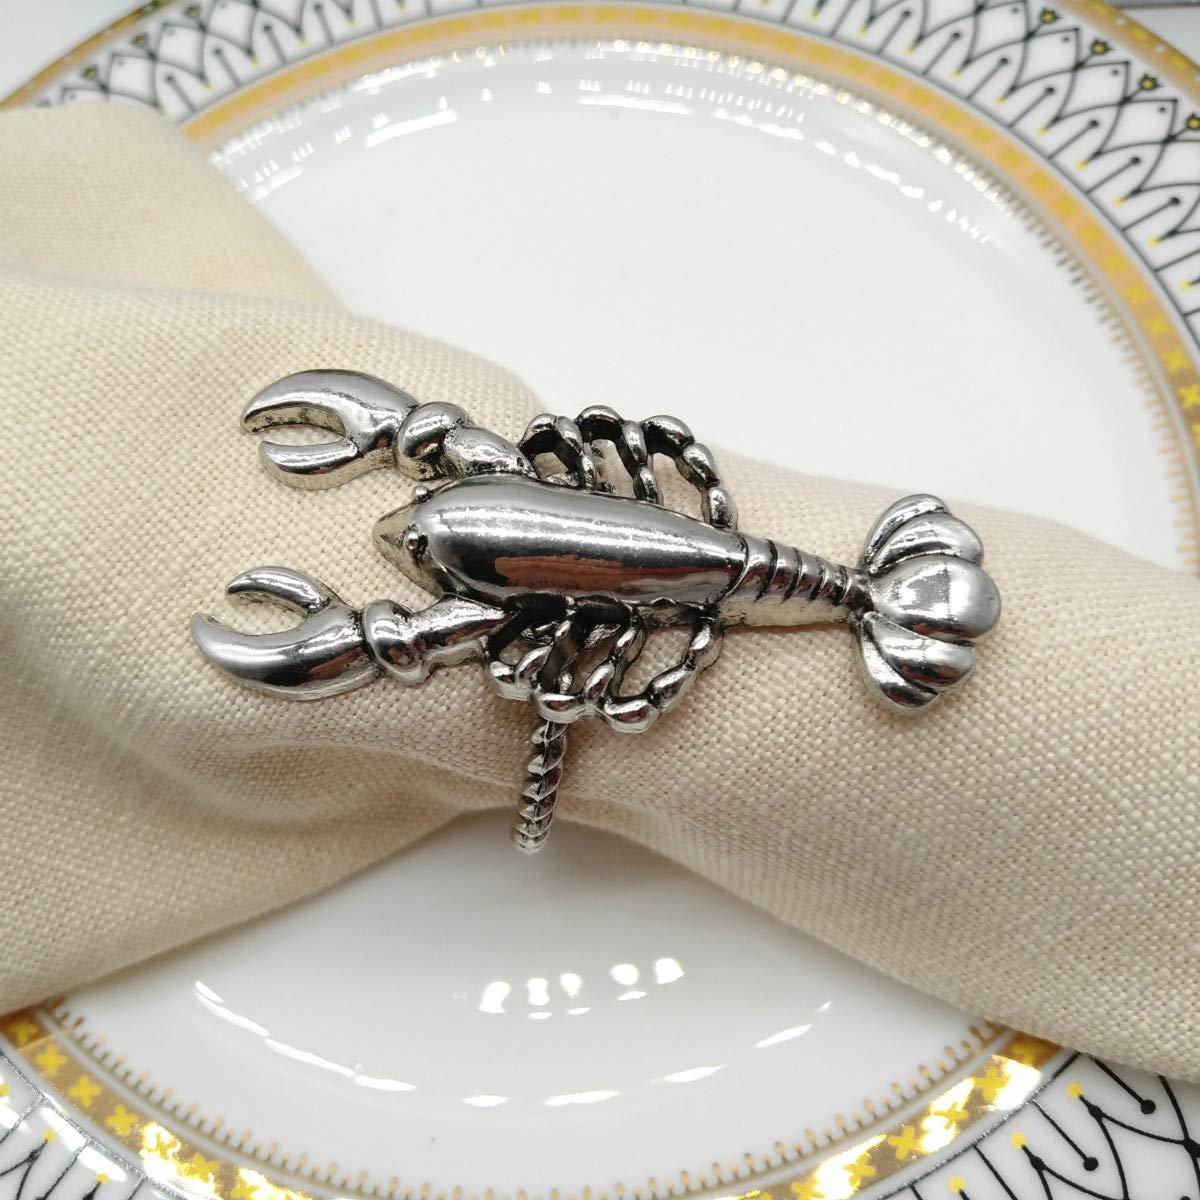 Beach Theme Table Decor Accessory Joyindecor Seahorse Napkin Rings Set of 6 Vintage Ocean Nautical Diamond Metal Napkin Ring Holders for Wedding Party Crystal Seahorse Golden